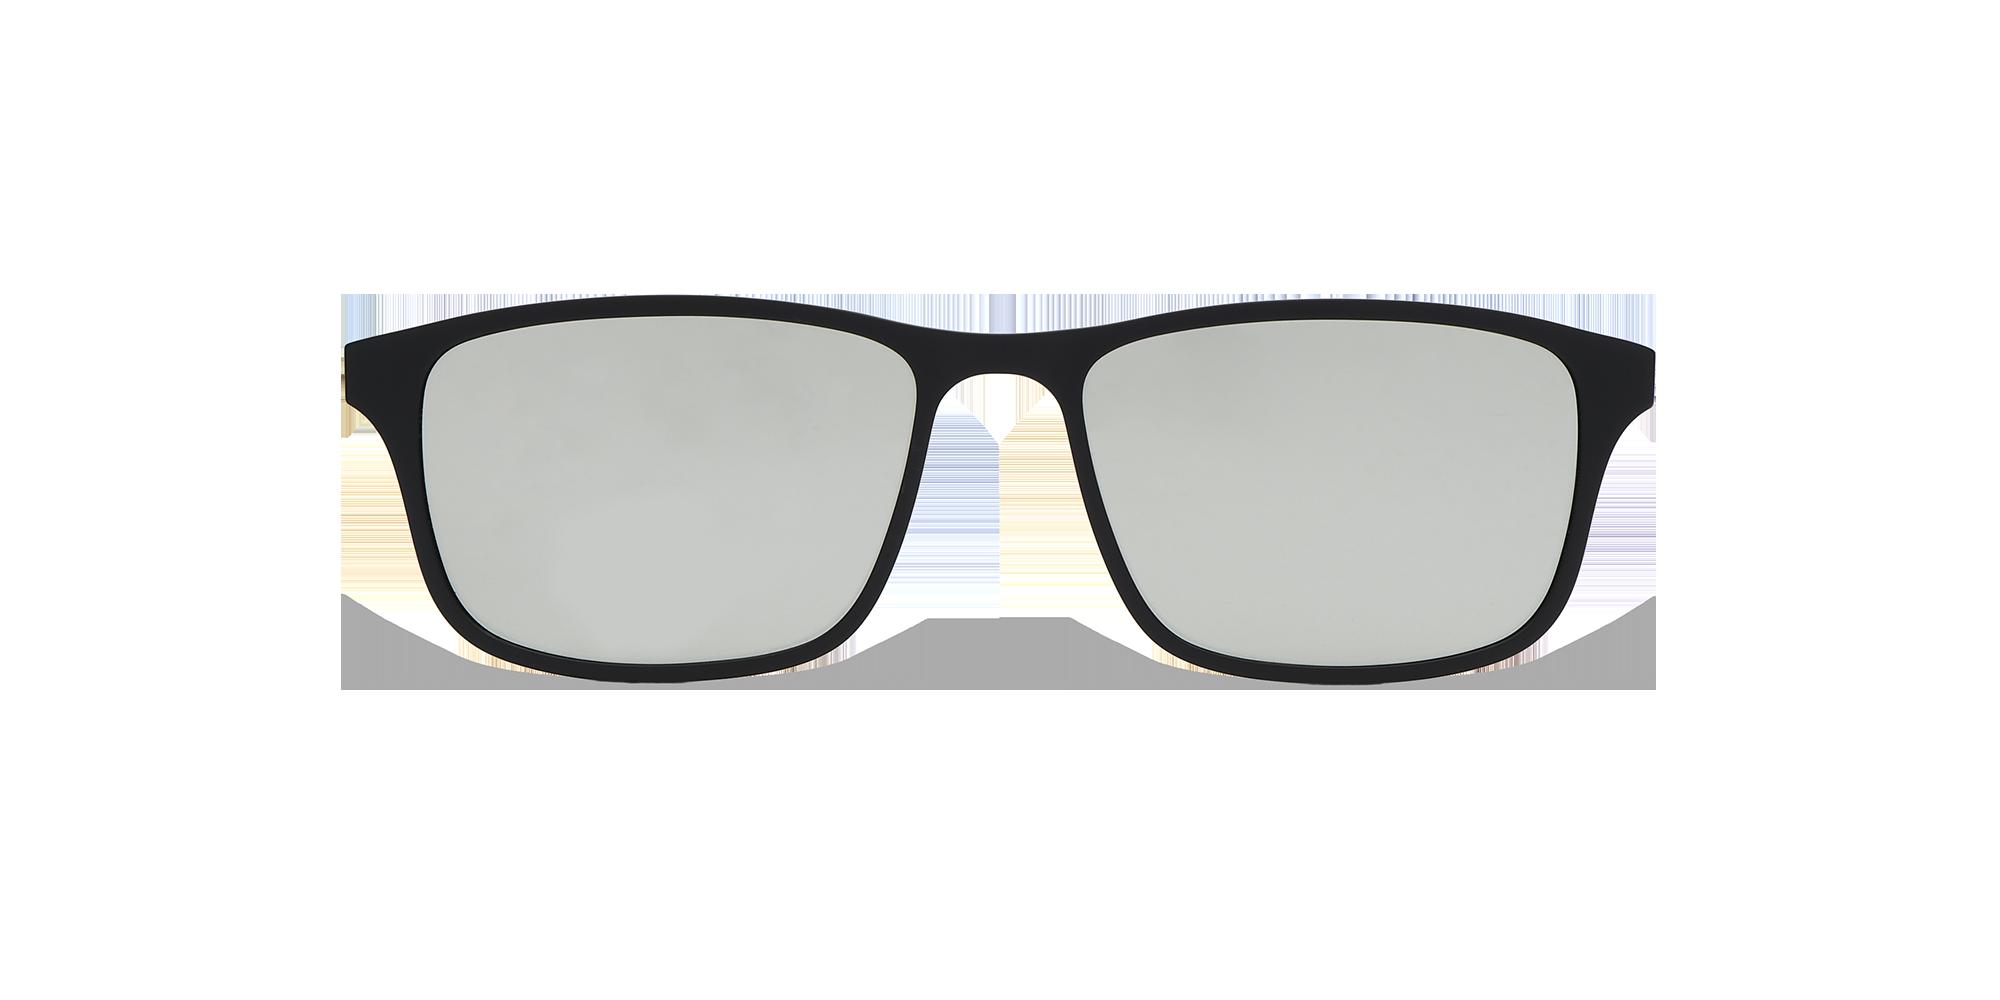 afflelou/france/products/smart_clip/clips_glasses/TMK41R3BK015416.png